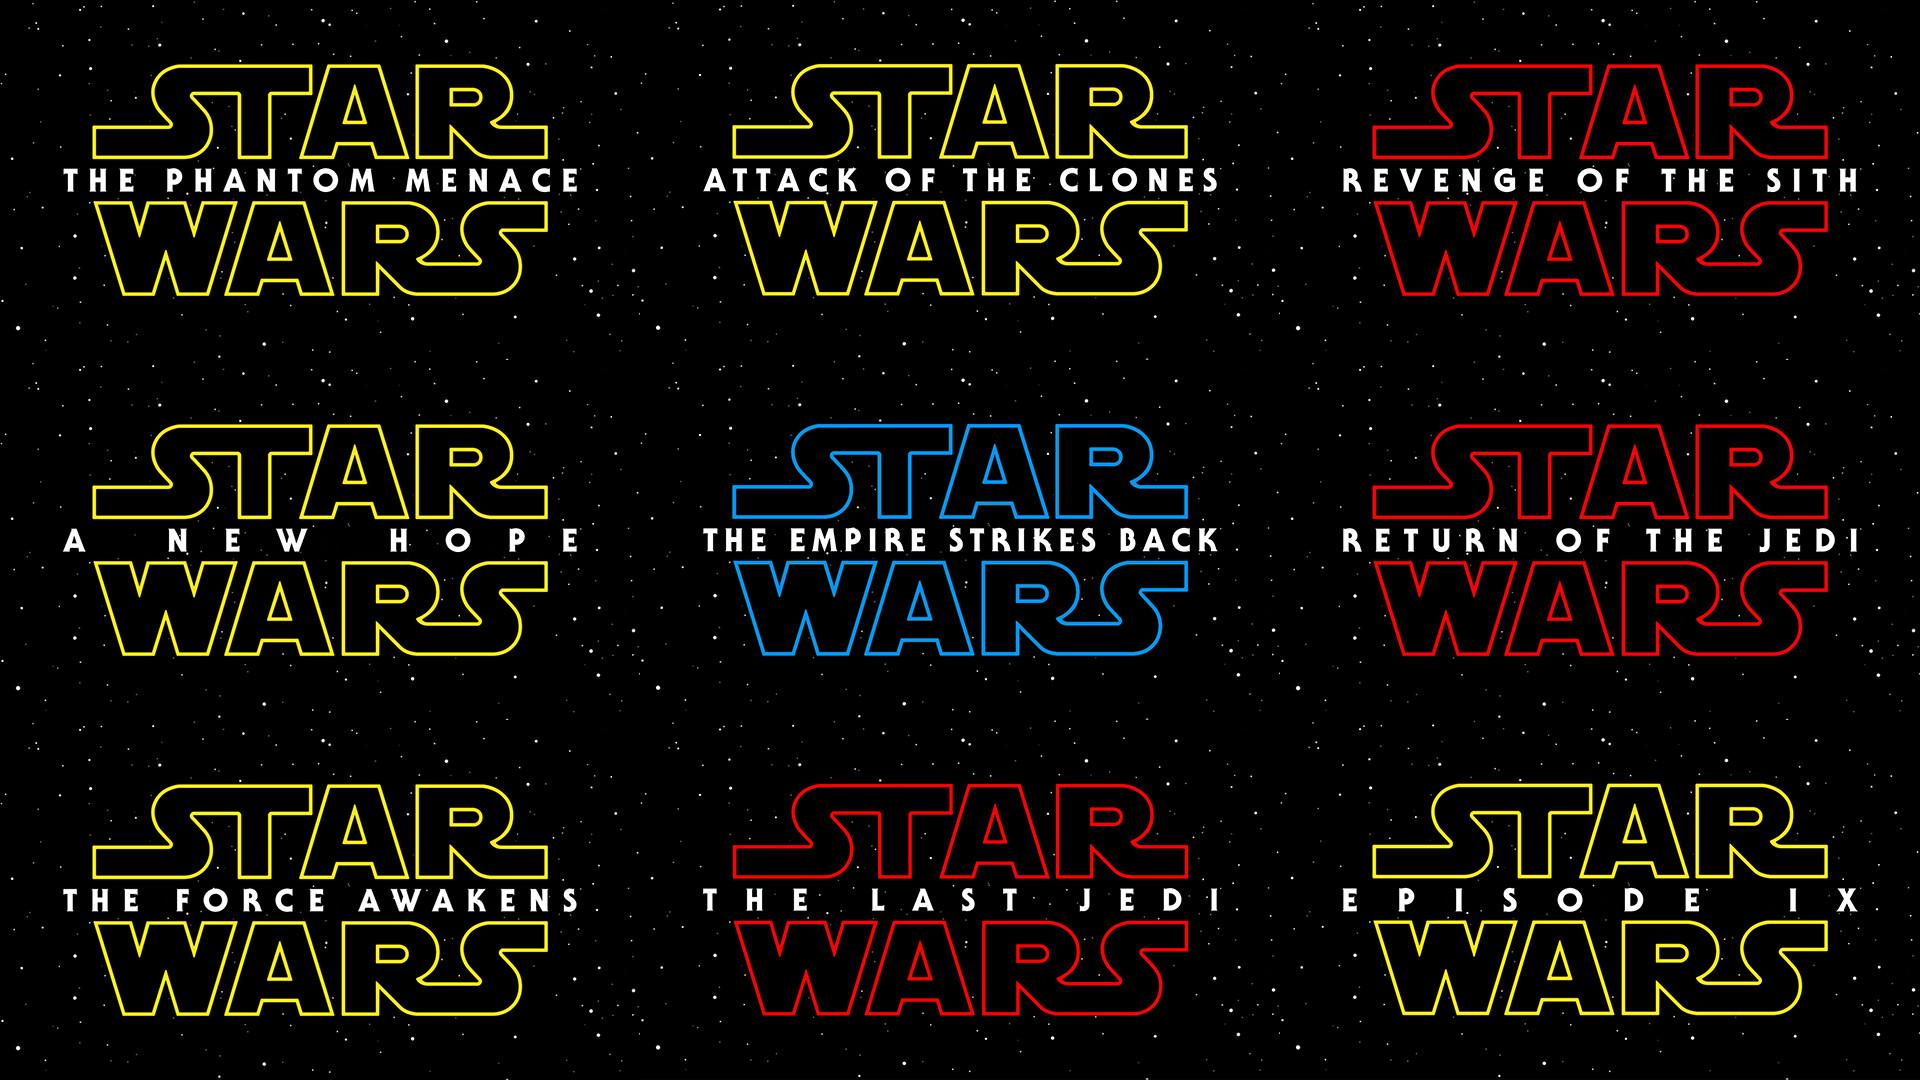 Star Wars Logo Wallpapers Data Src Star Wars Logo Background 1920x1080 Download Hd Wallpaper Wallpapertip